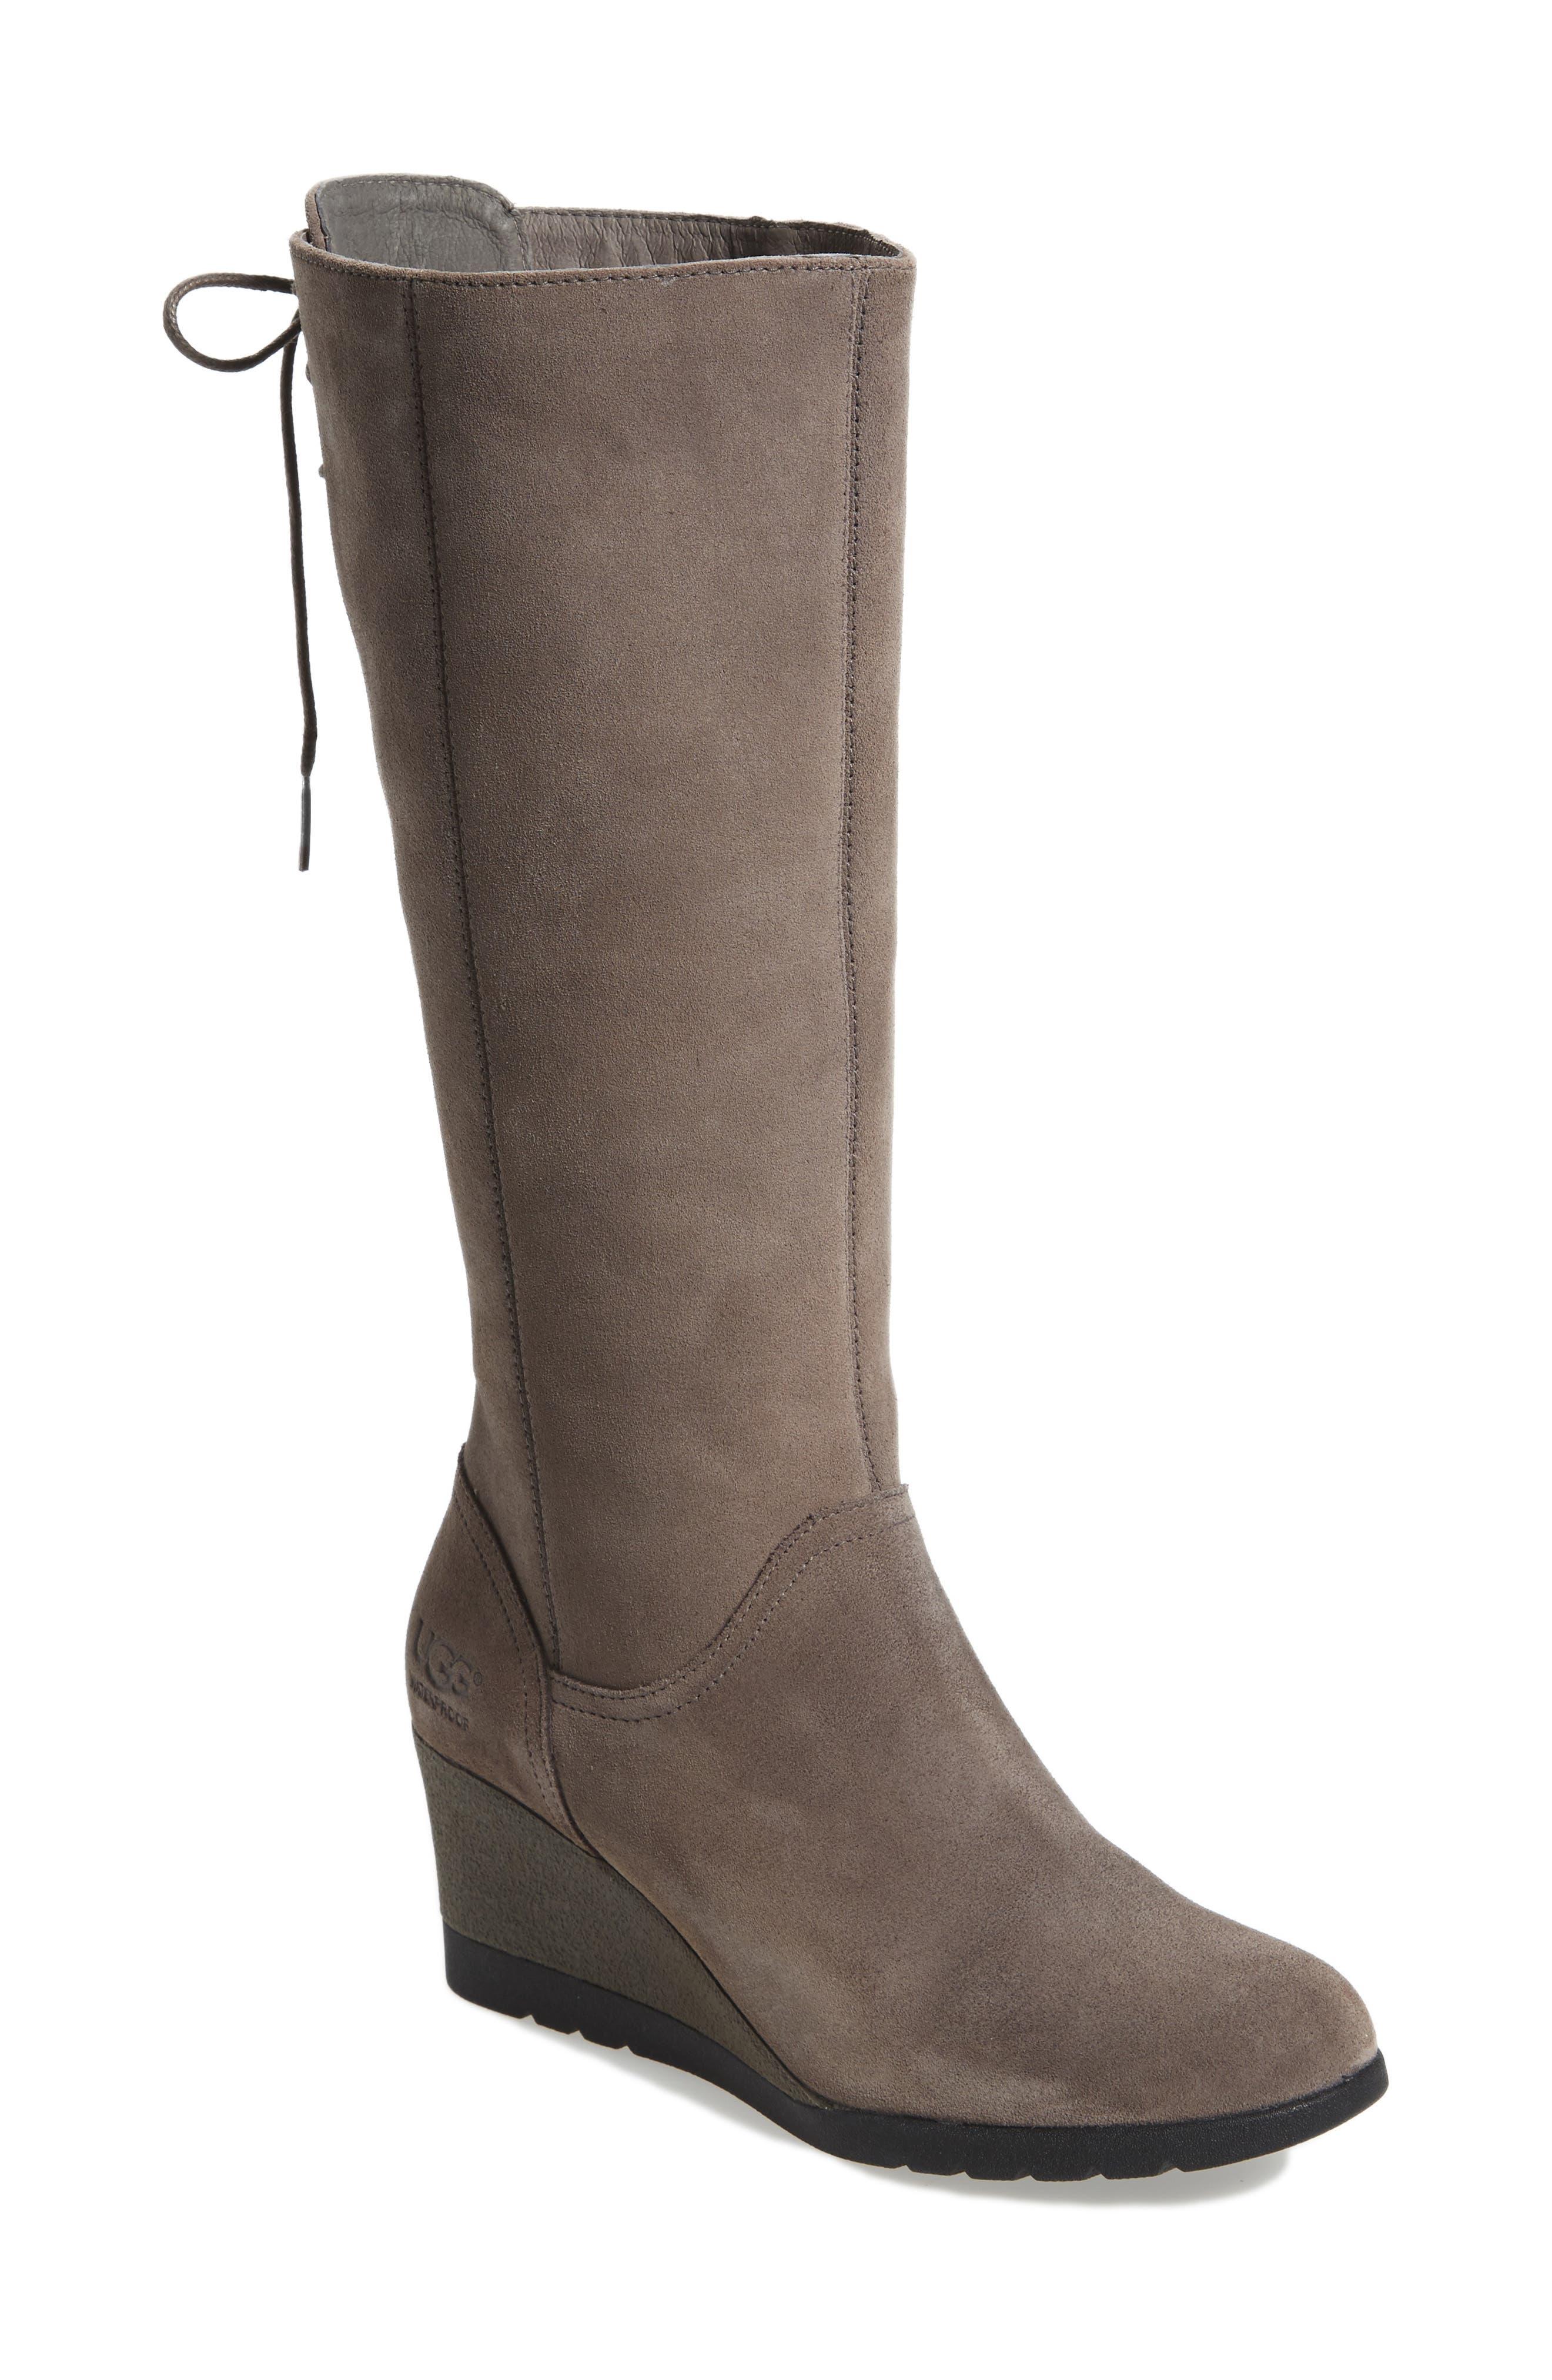 Ugg Dawna Waterproof Wedge Boot, Grey